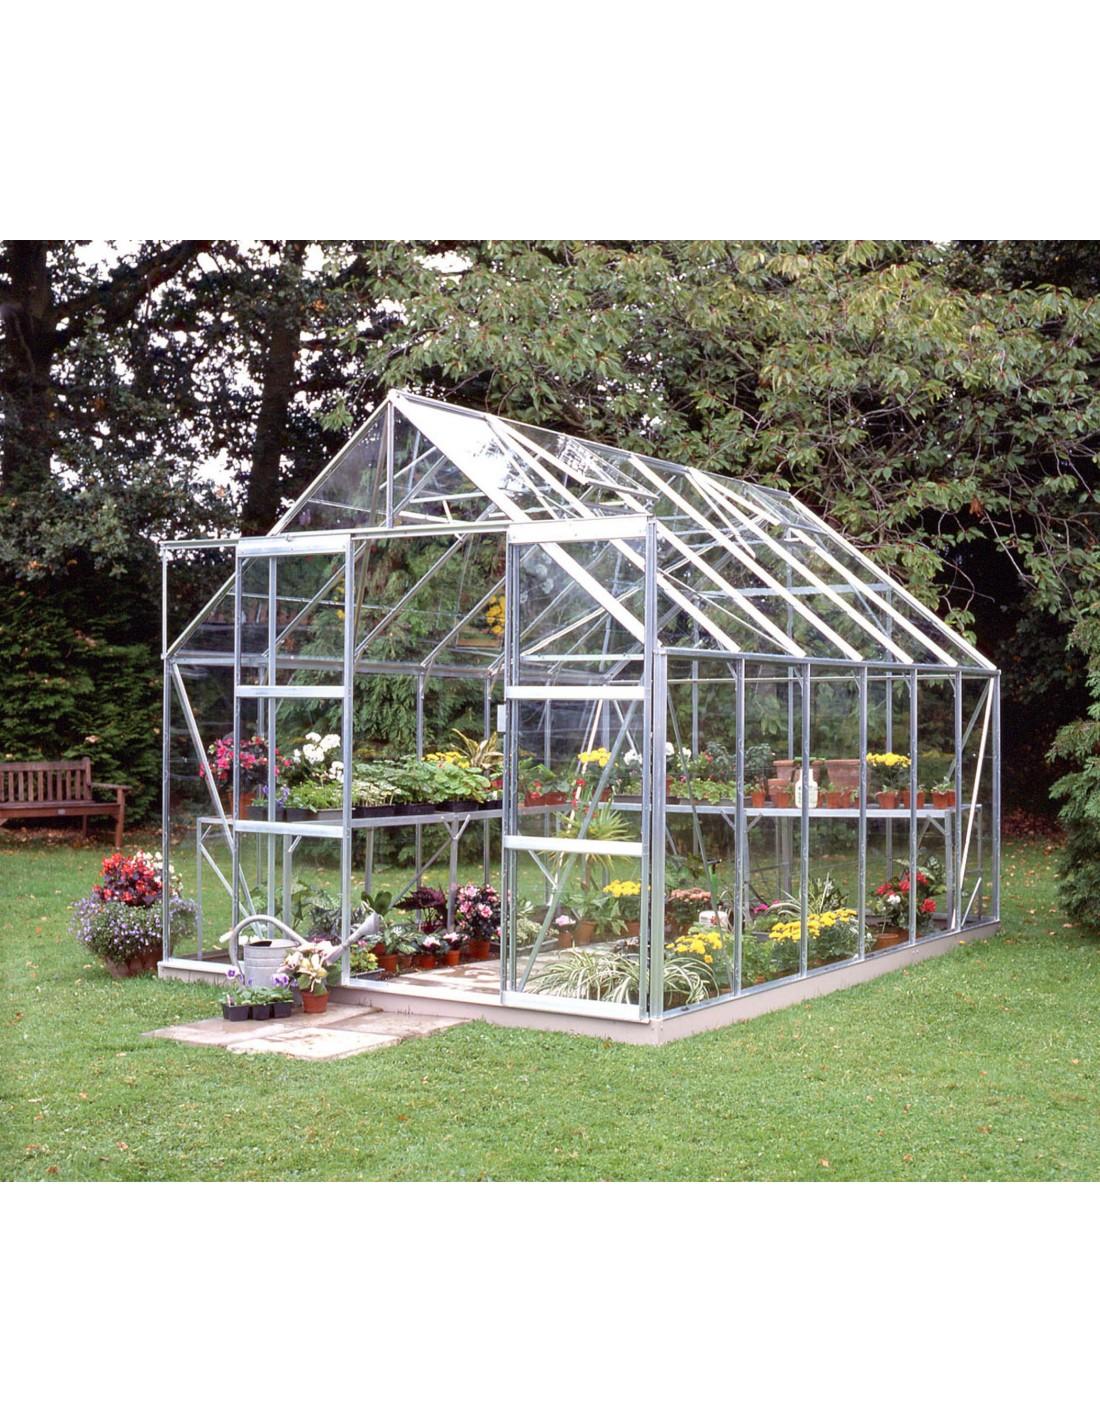 Serre de jardin magnum 9 9 m verre horticole de 3 mm - Serre de jardin en verre horticole ...